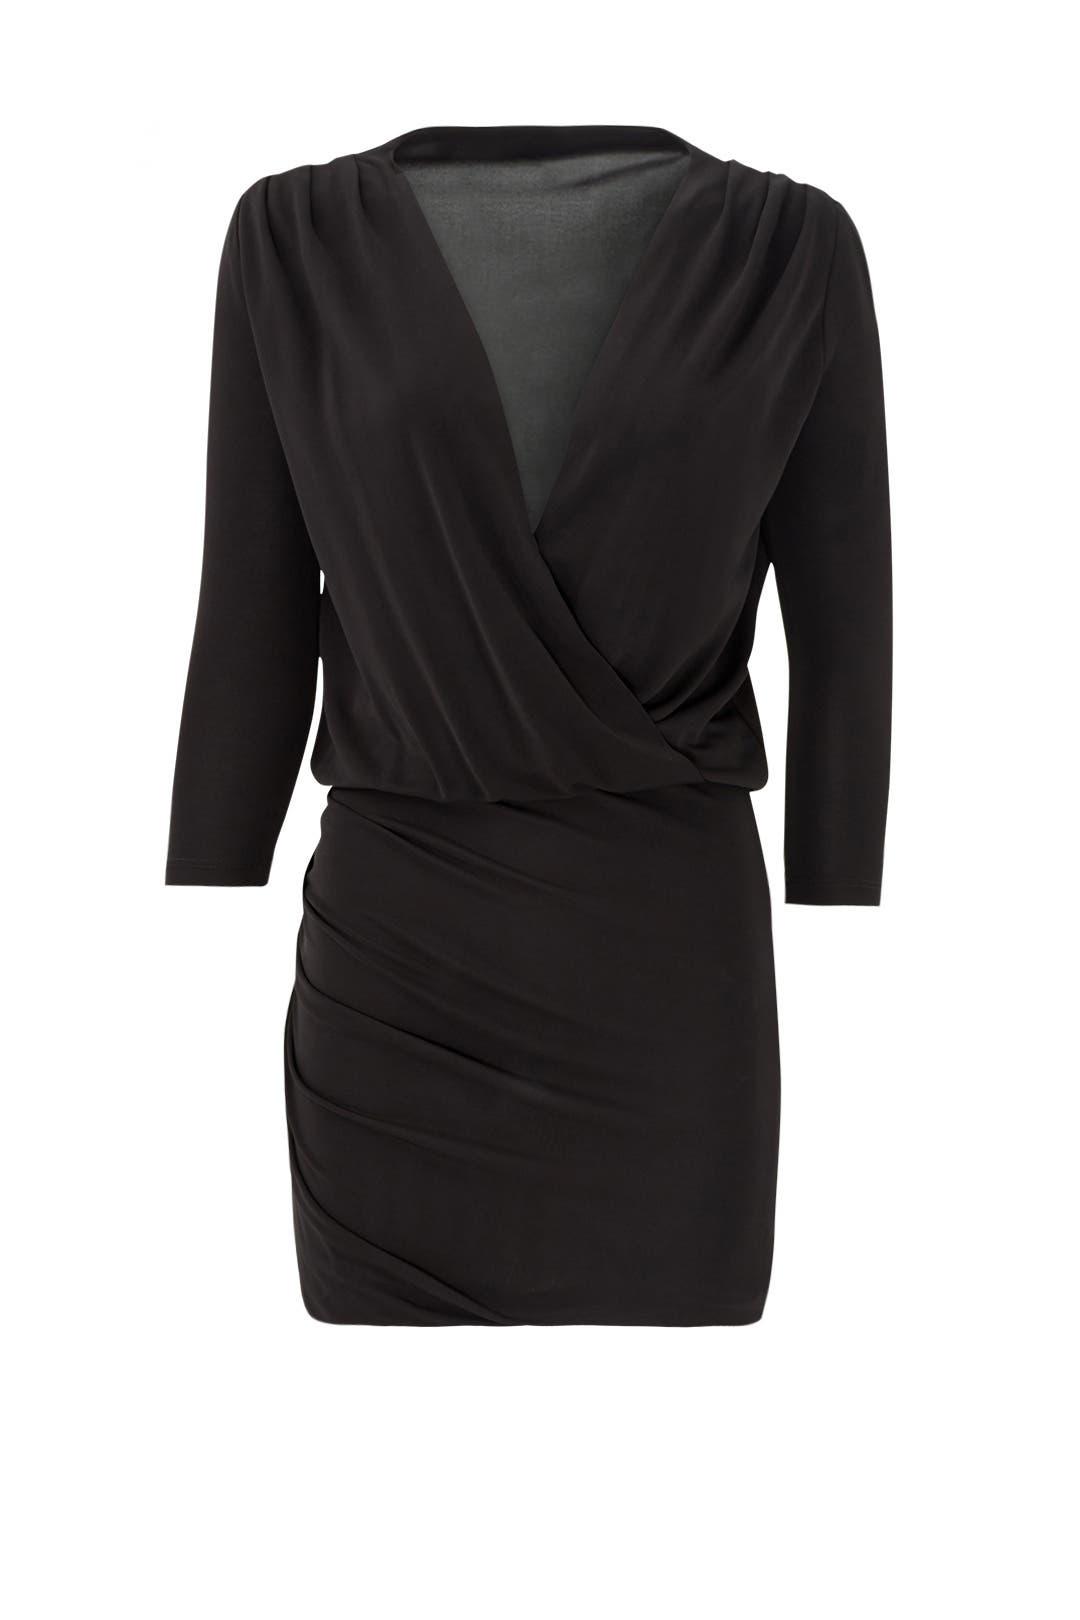 Alissa Dress by Slate & Willow